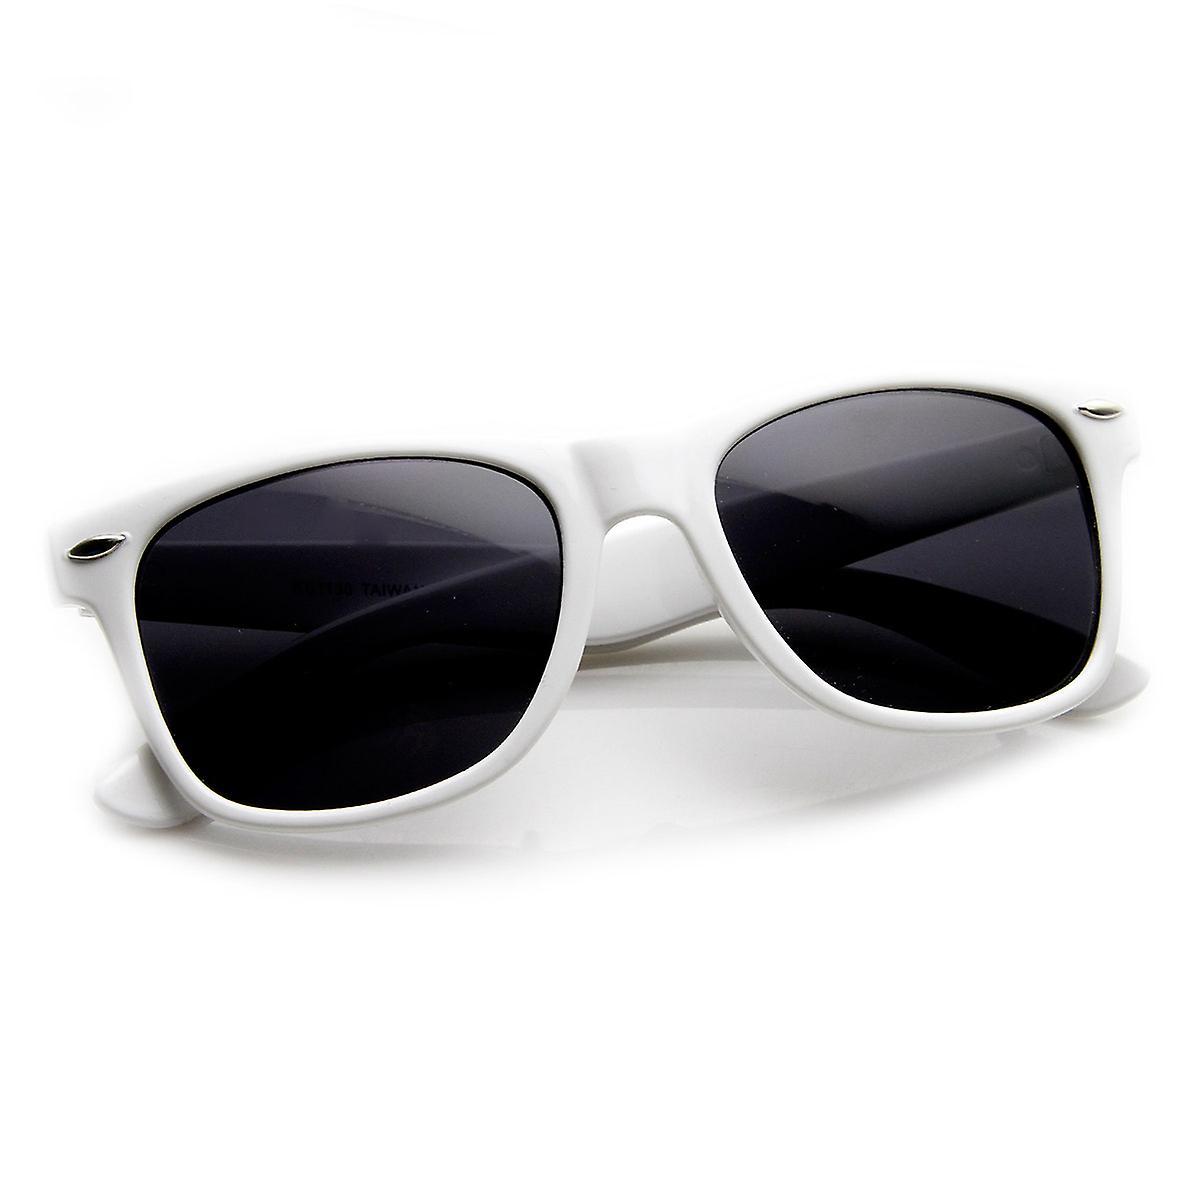 c417138489 Classic Original Shape Color Coated Horn Rimmed Sunglasses